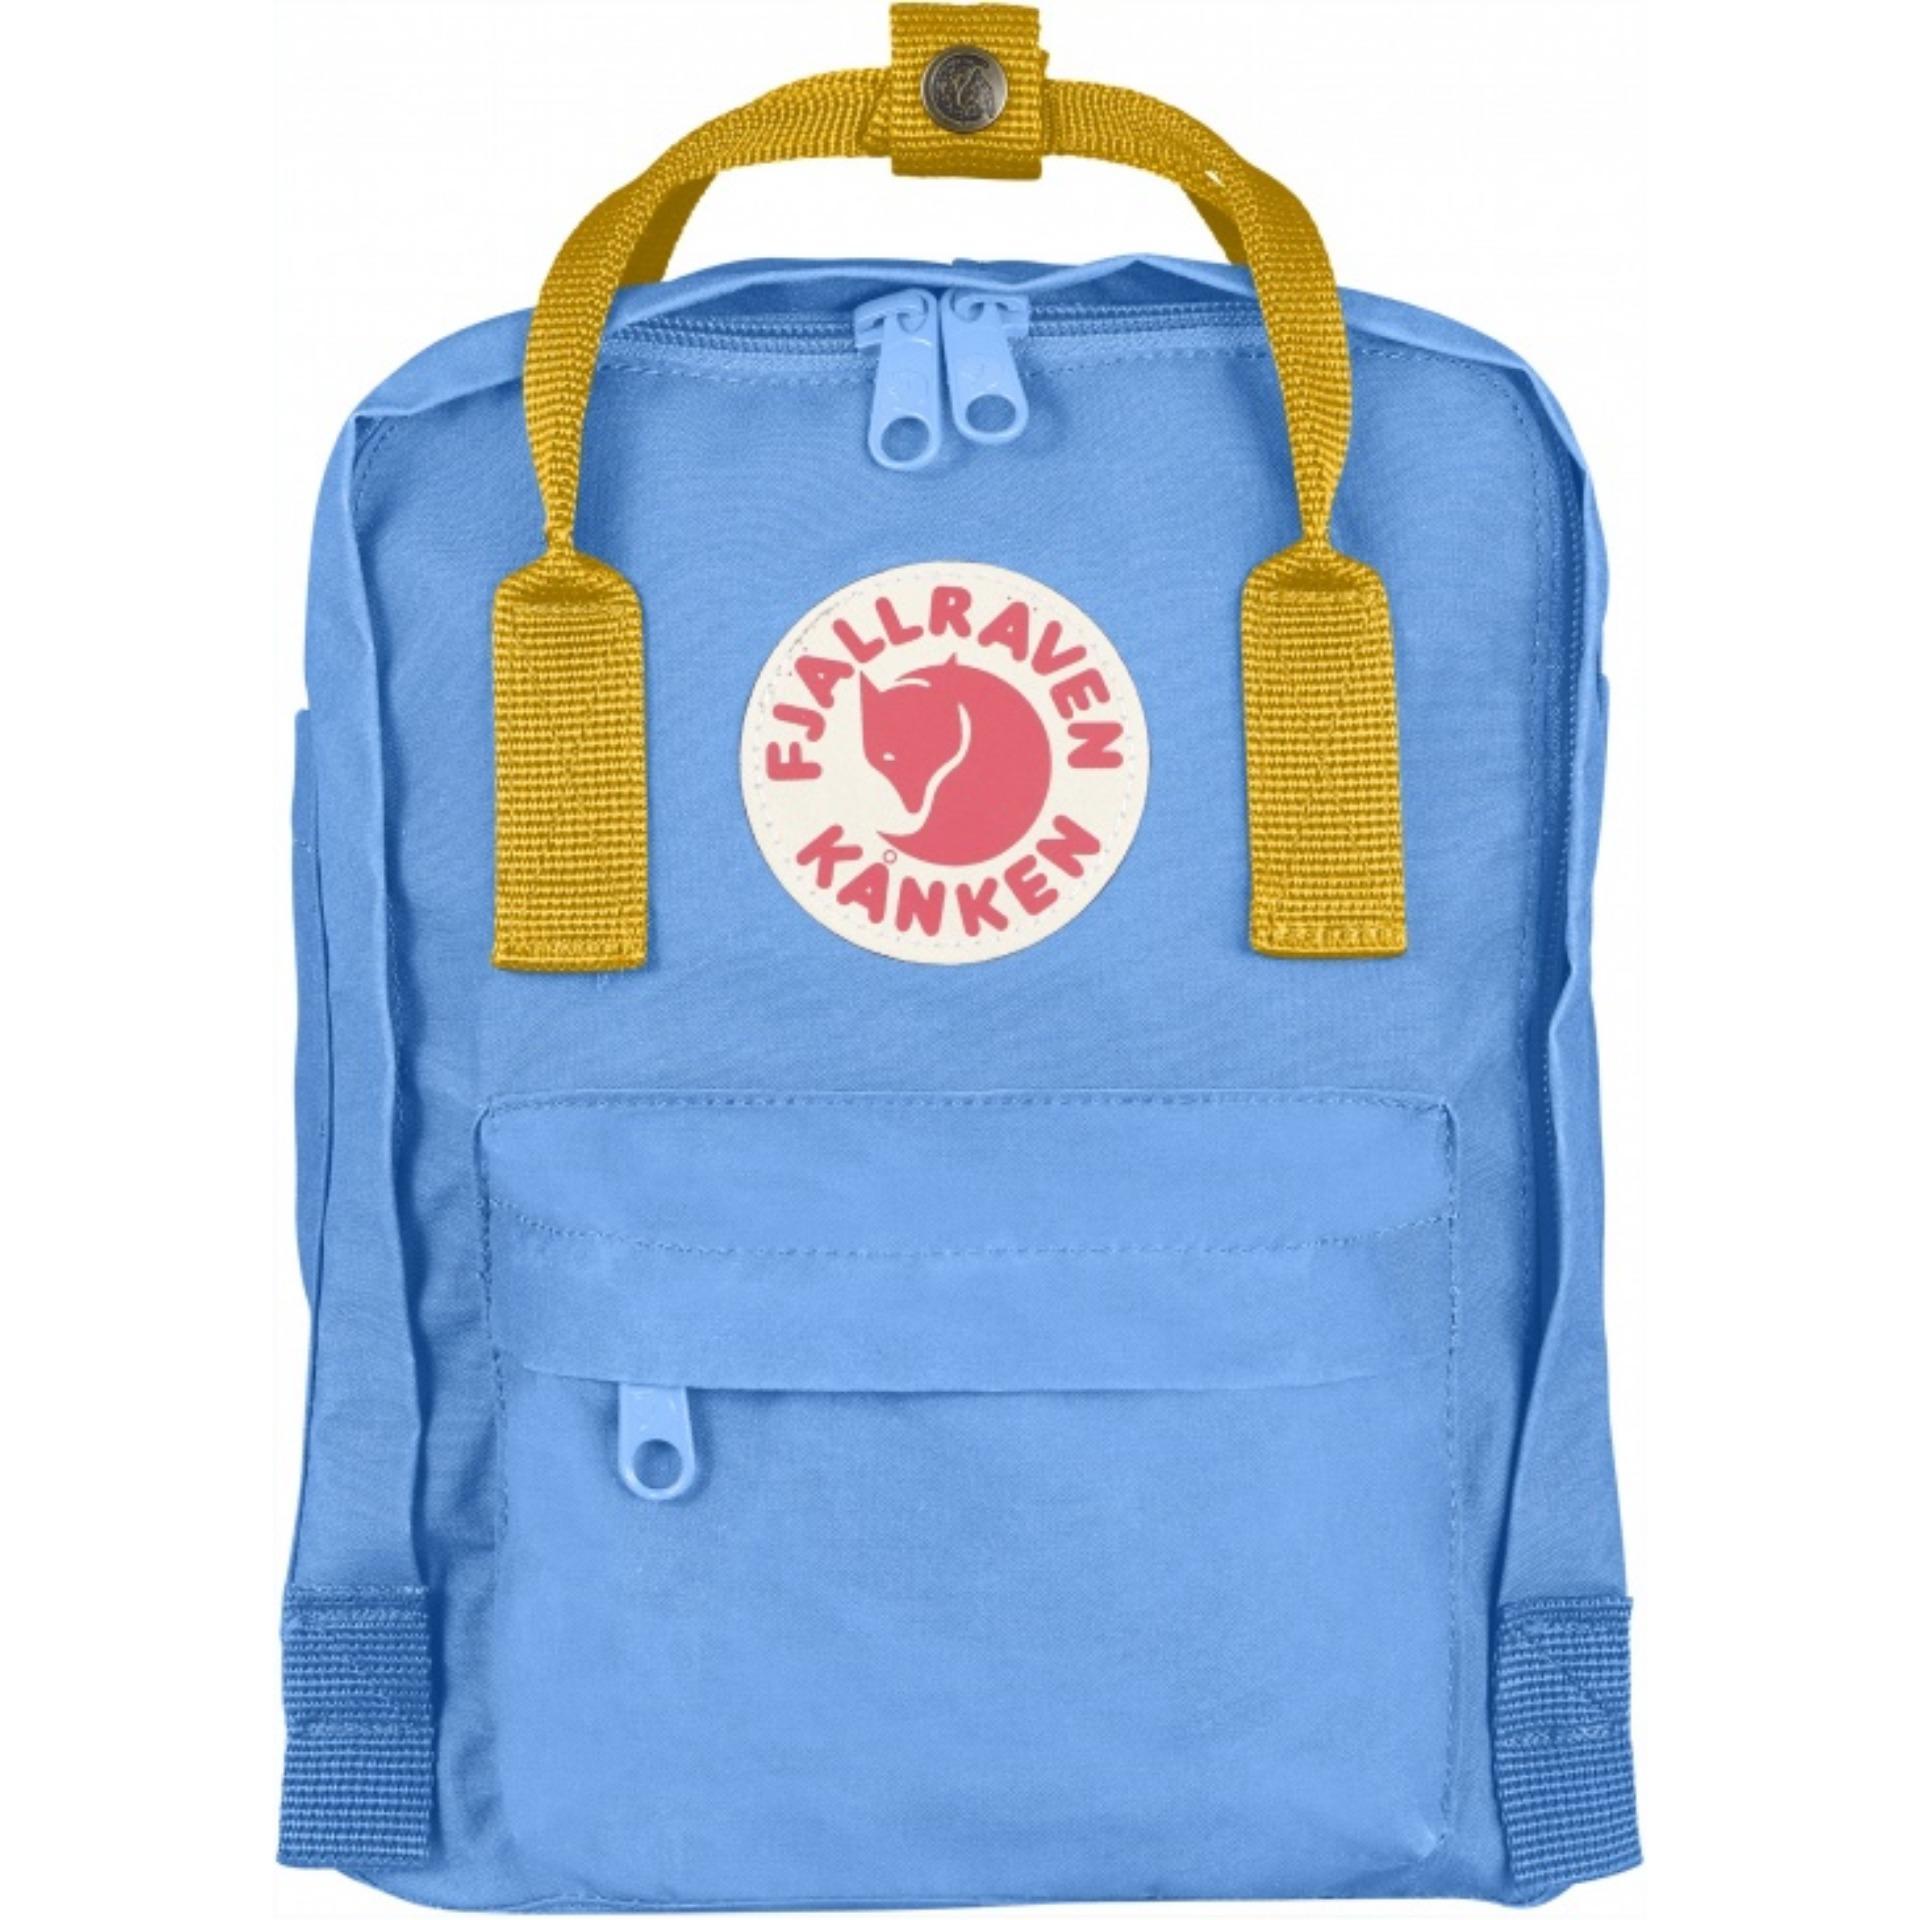 b98d88eff Buy Fjallraven Duffel | Backpack | Bags | Lazada